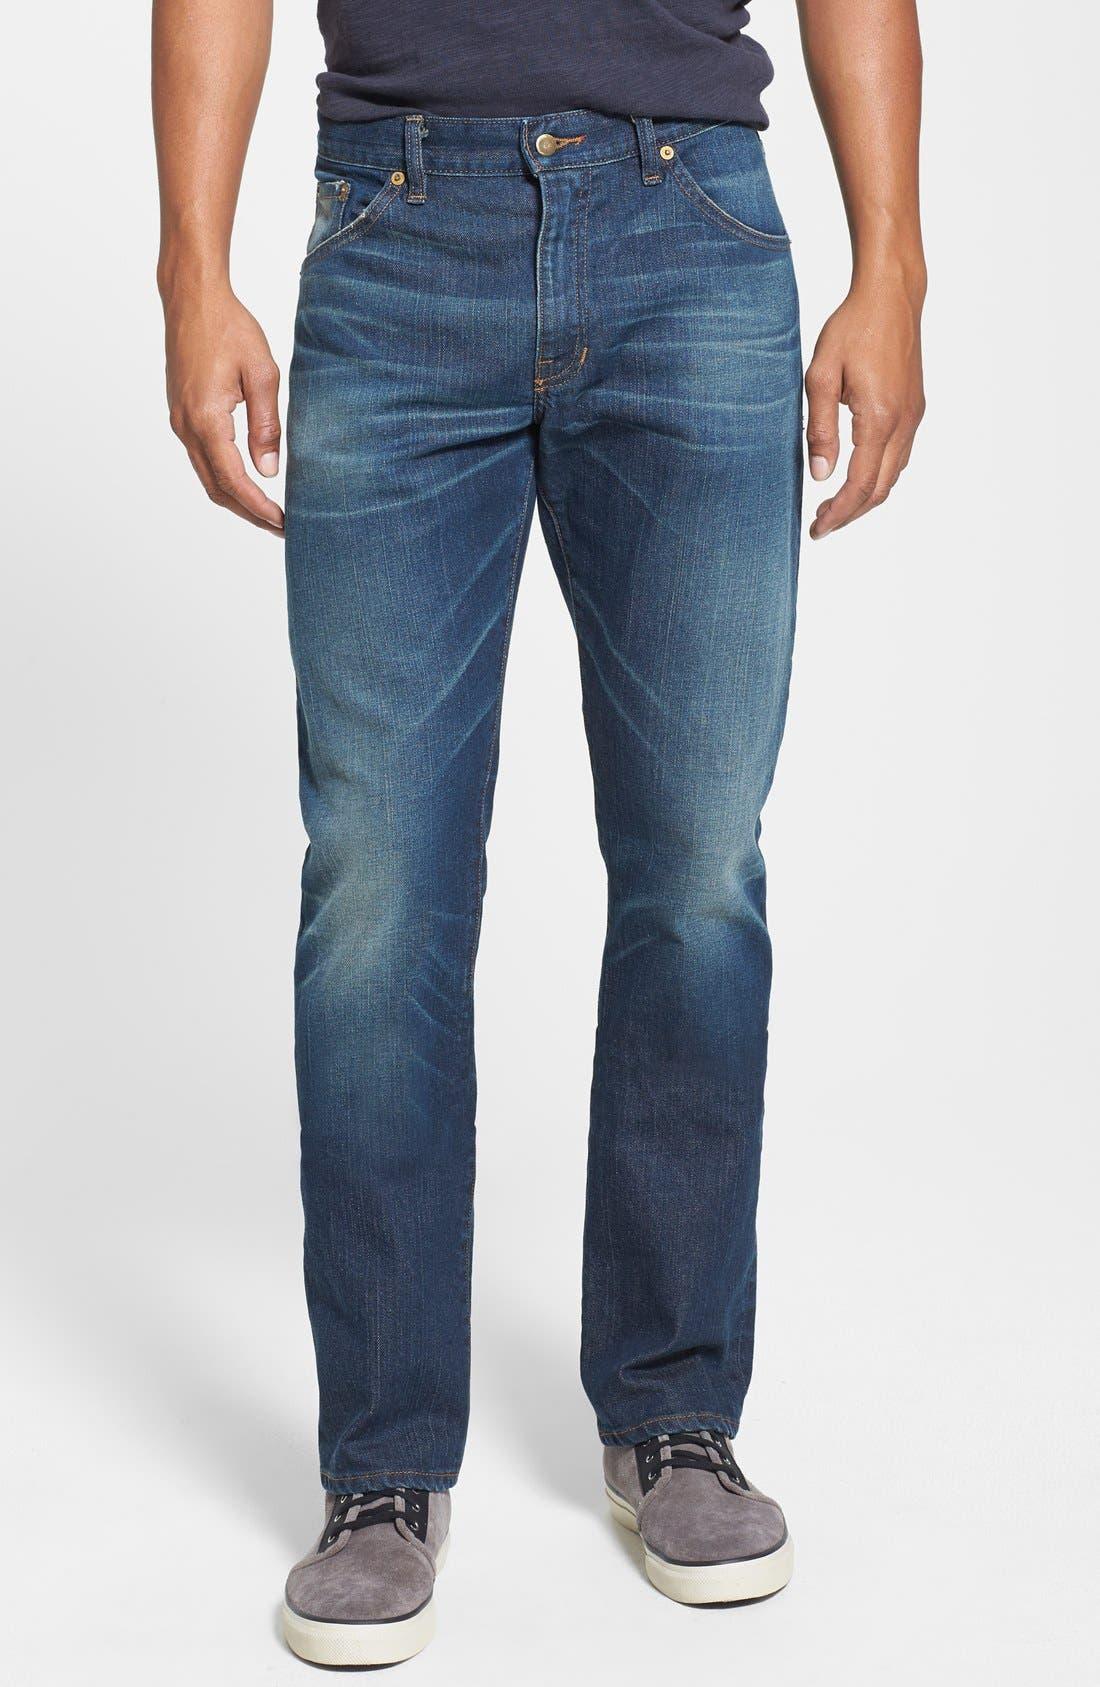 'Jones' Slim Straight Fit Jeans,                             Main thumbnail 1, color,                             Camp